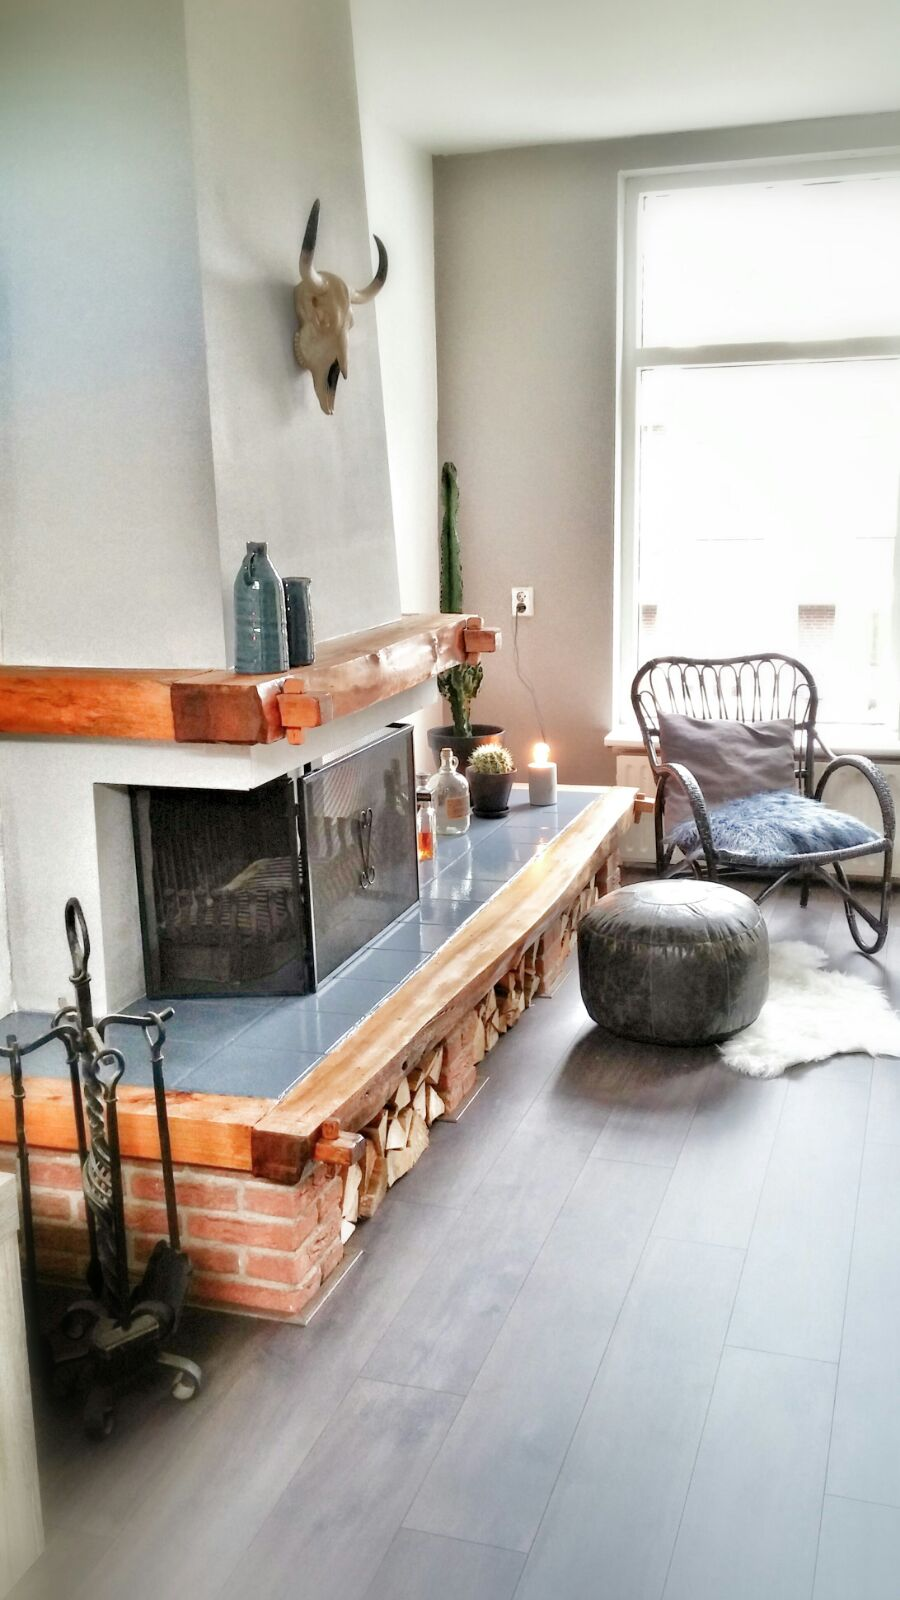 woonkamer interieurstyling industrieel stoer accessoires keramiek schouw open haard hout.jpg